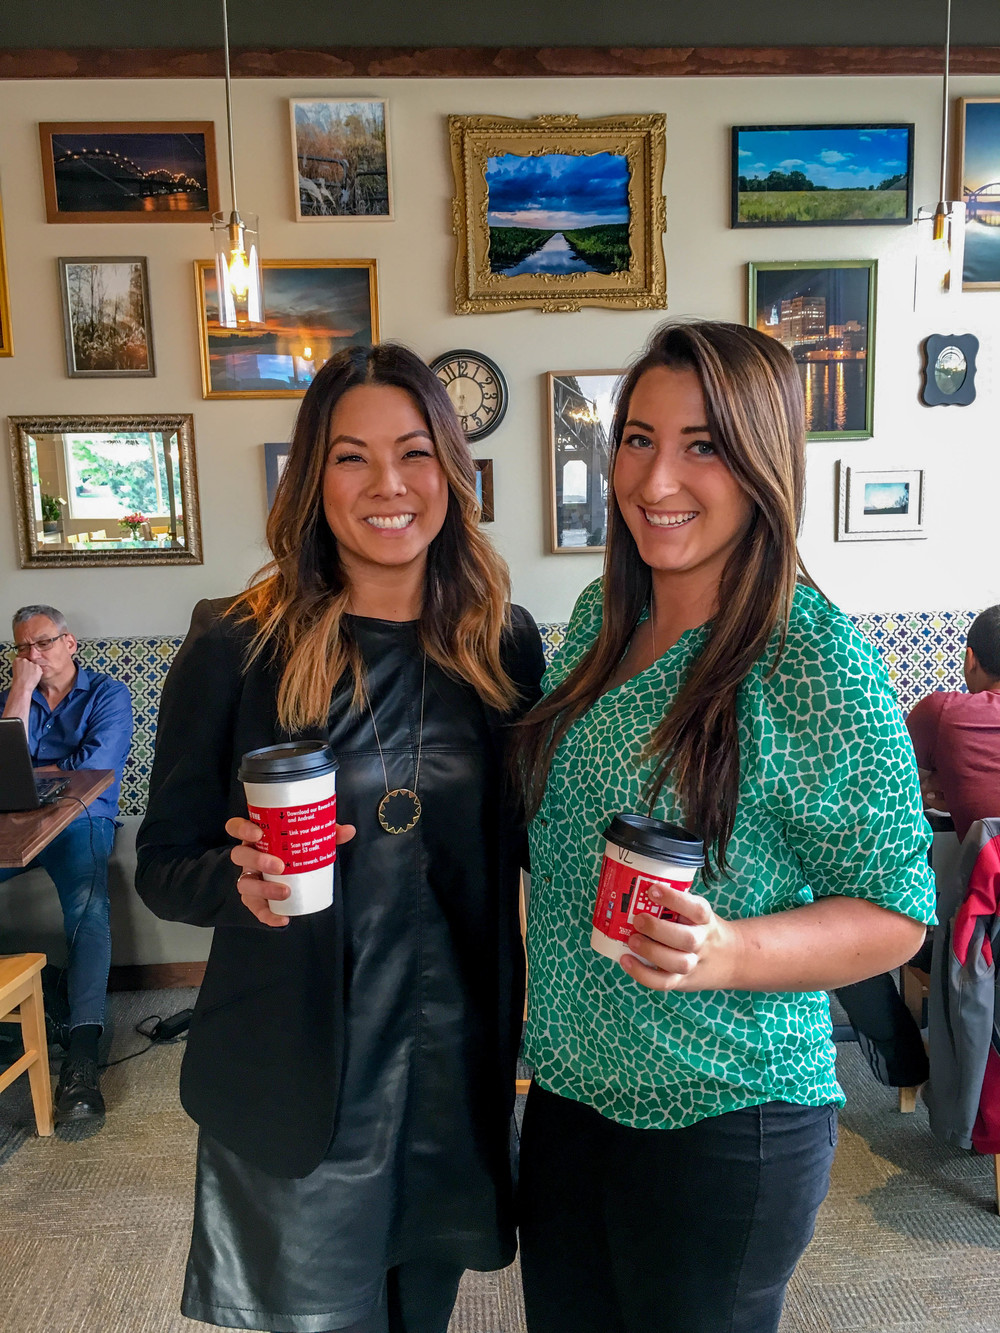 Enjoying Dunn Bros Coffee and their new Birchwood Fields location in Davenport, IA.